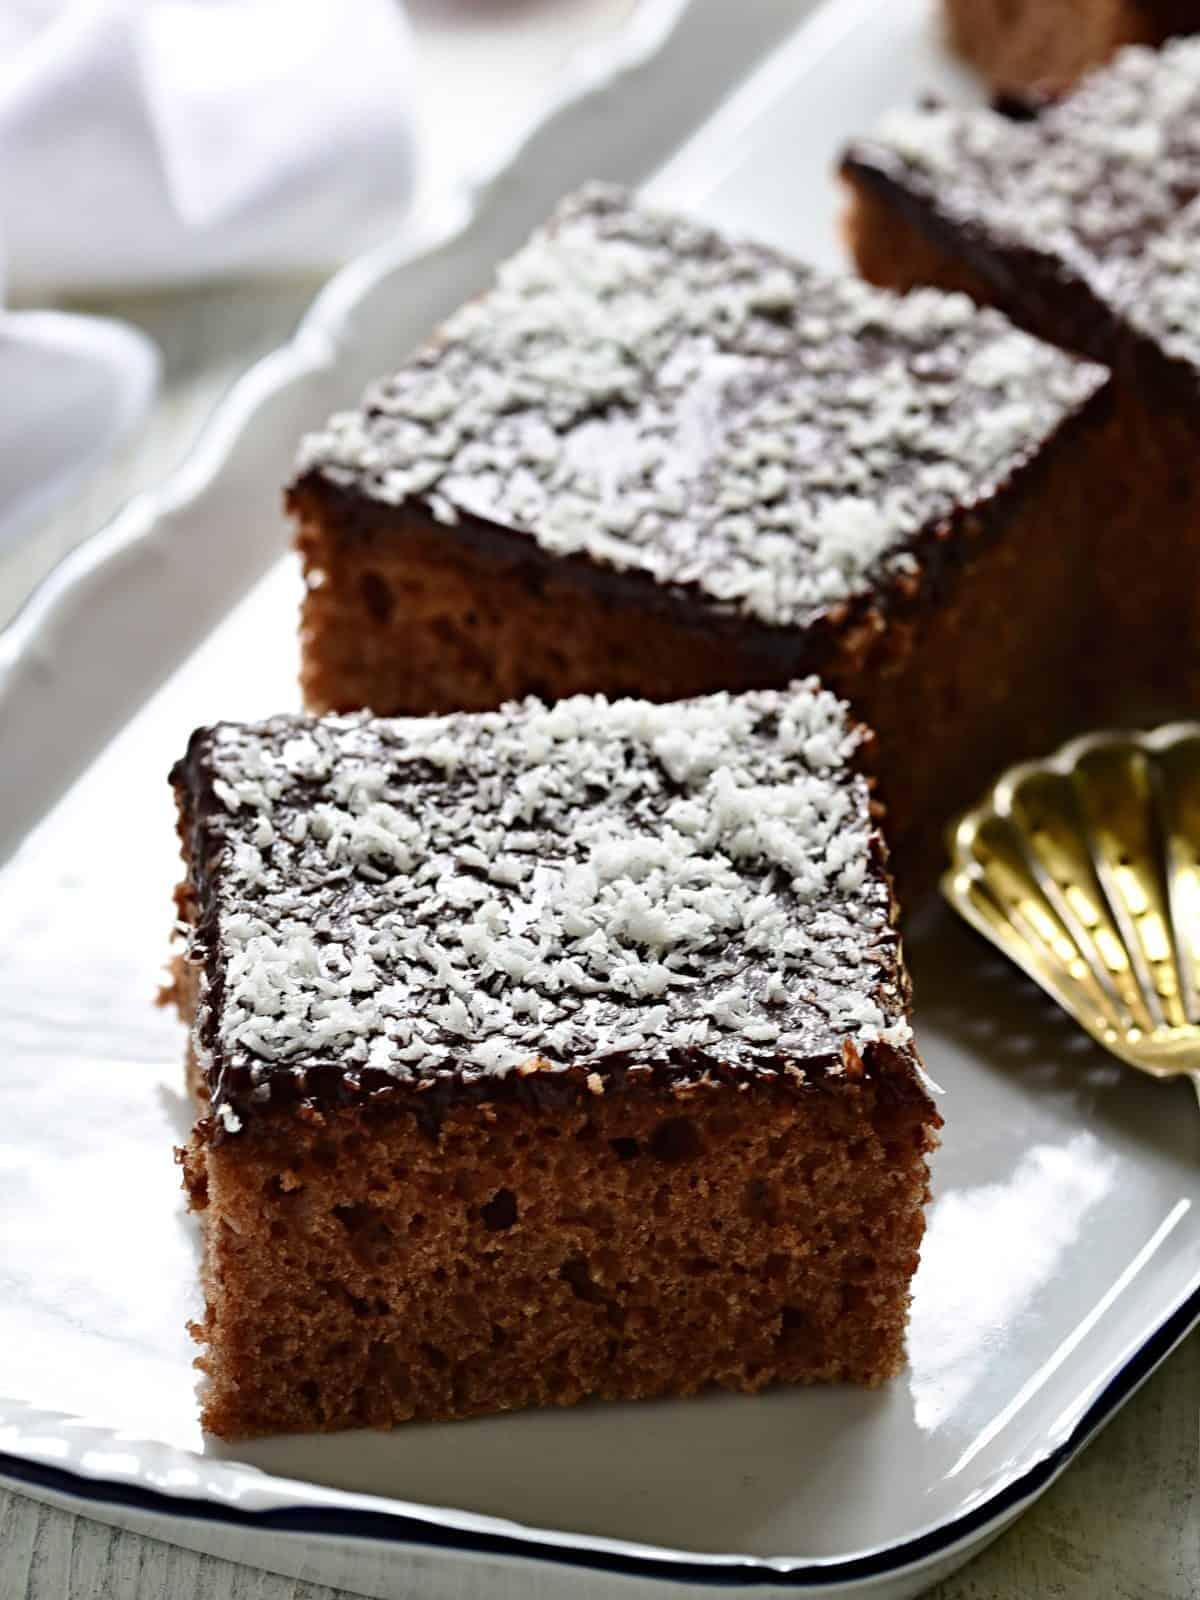 Buttermilk sheet cake served on a plate.